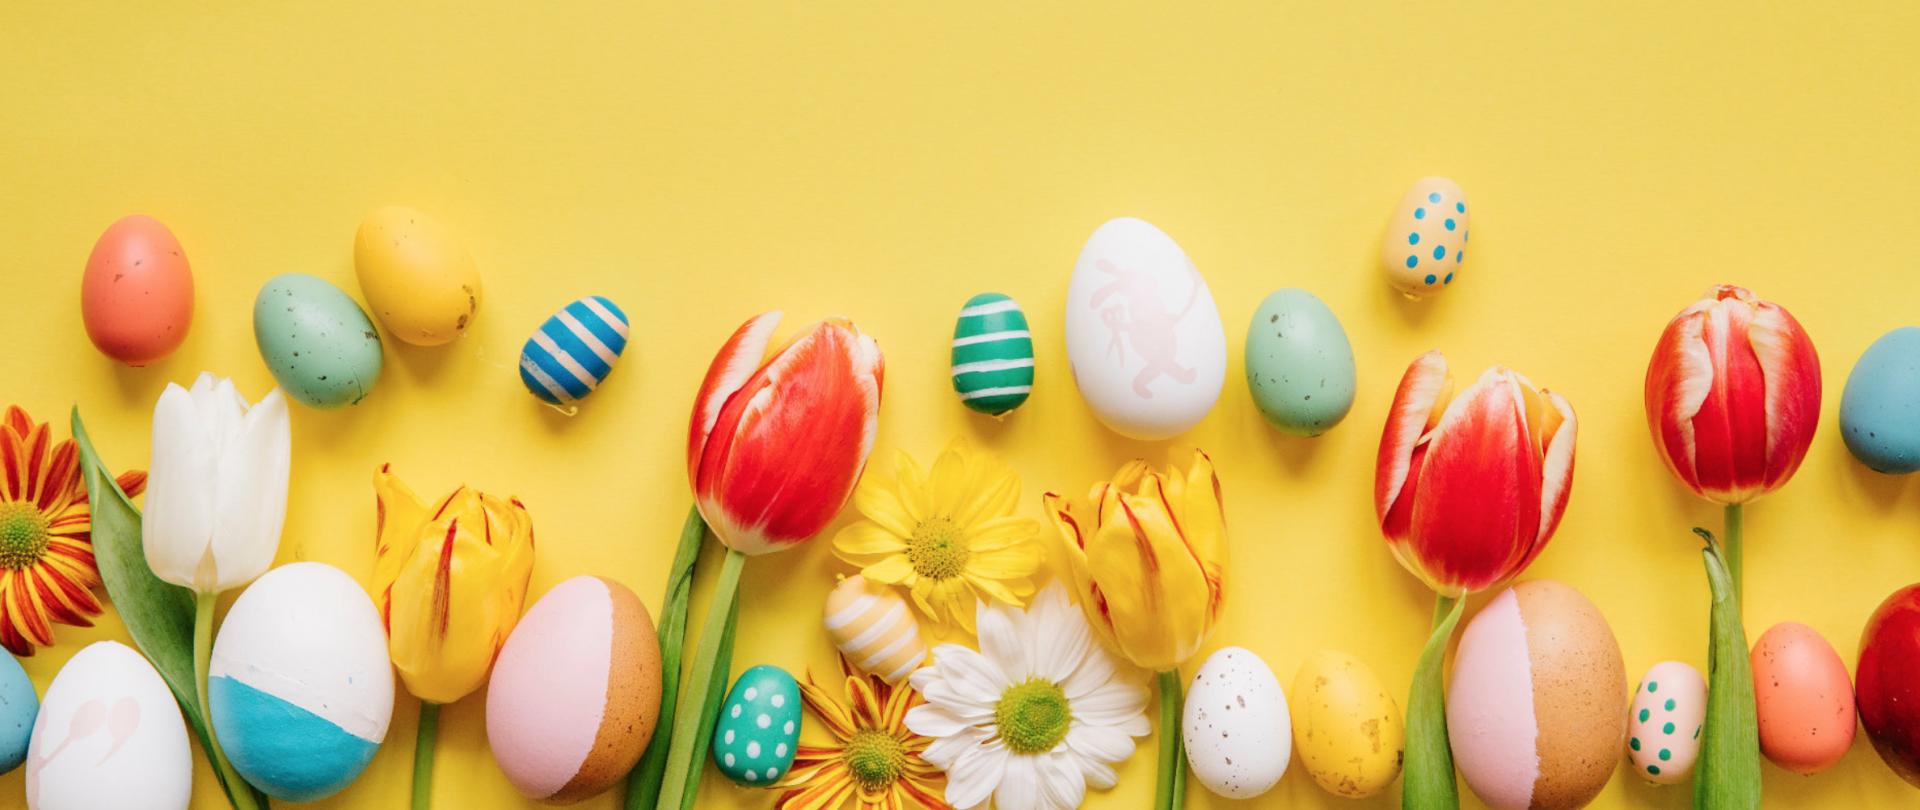 Wielkanoc na Zamku w Reszlu LAST MINUTE